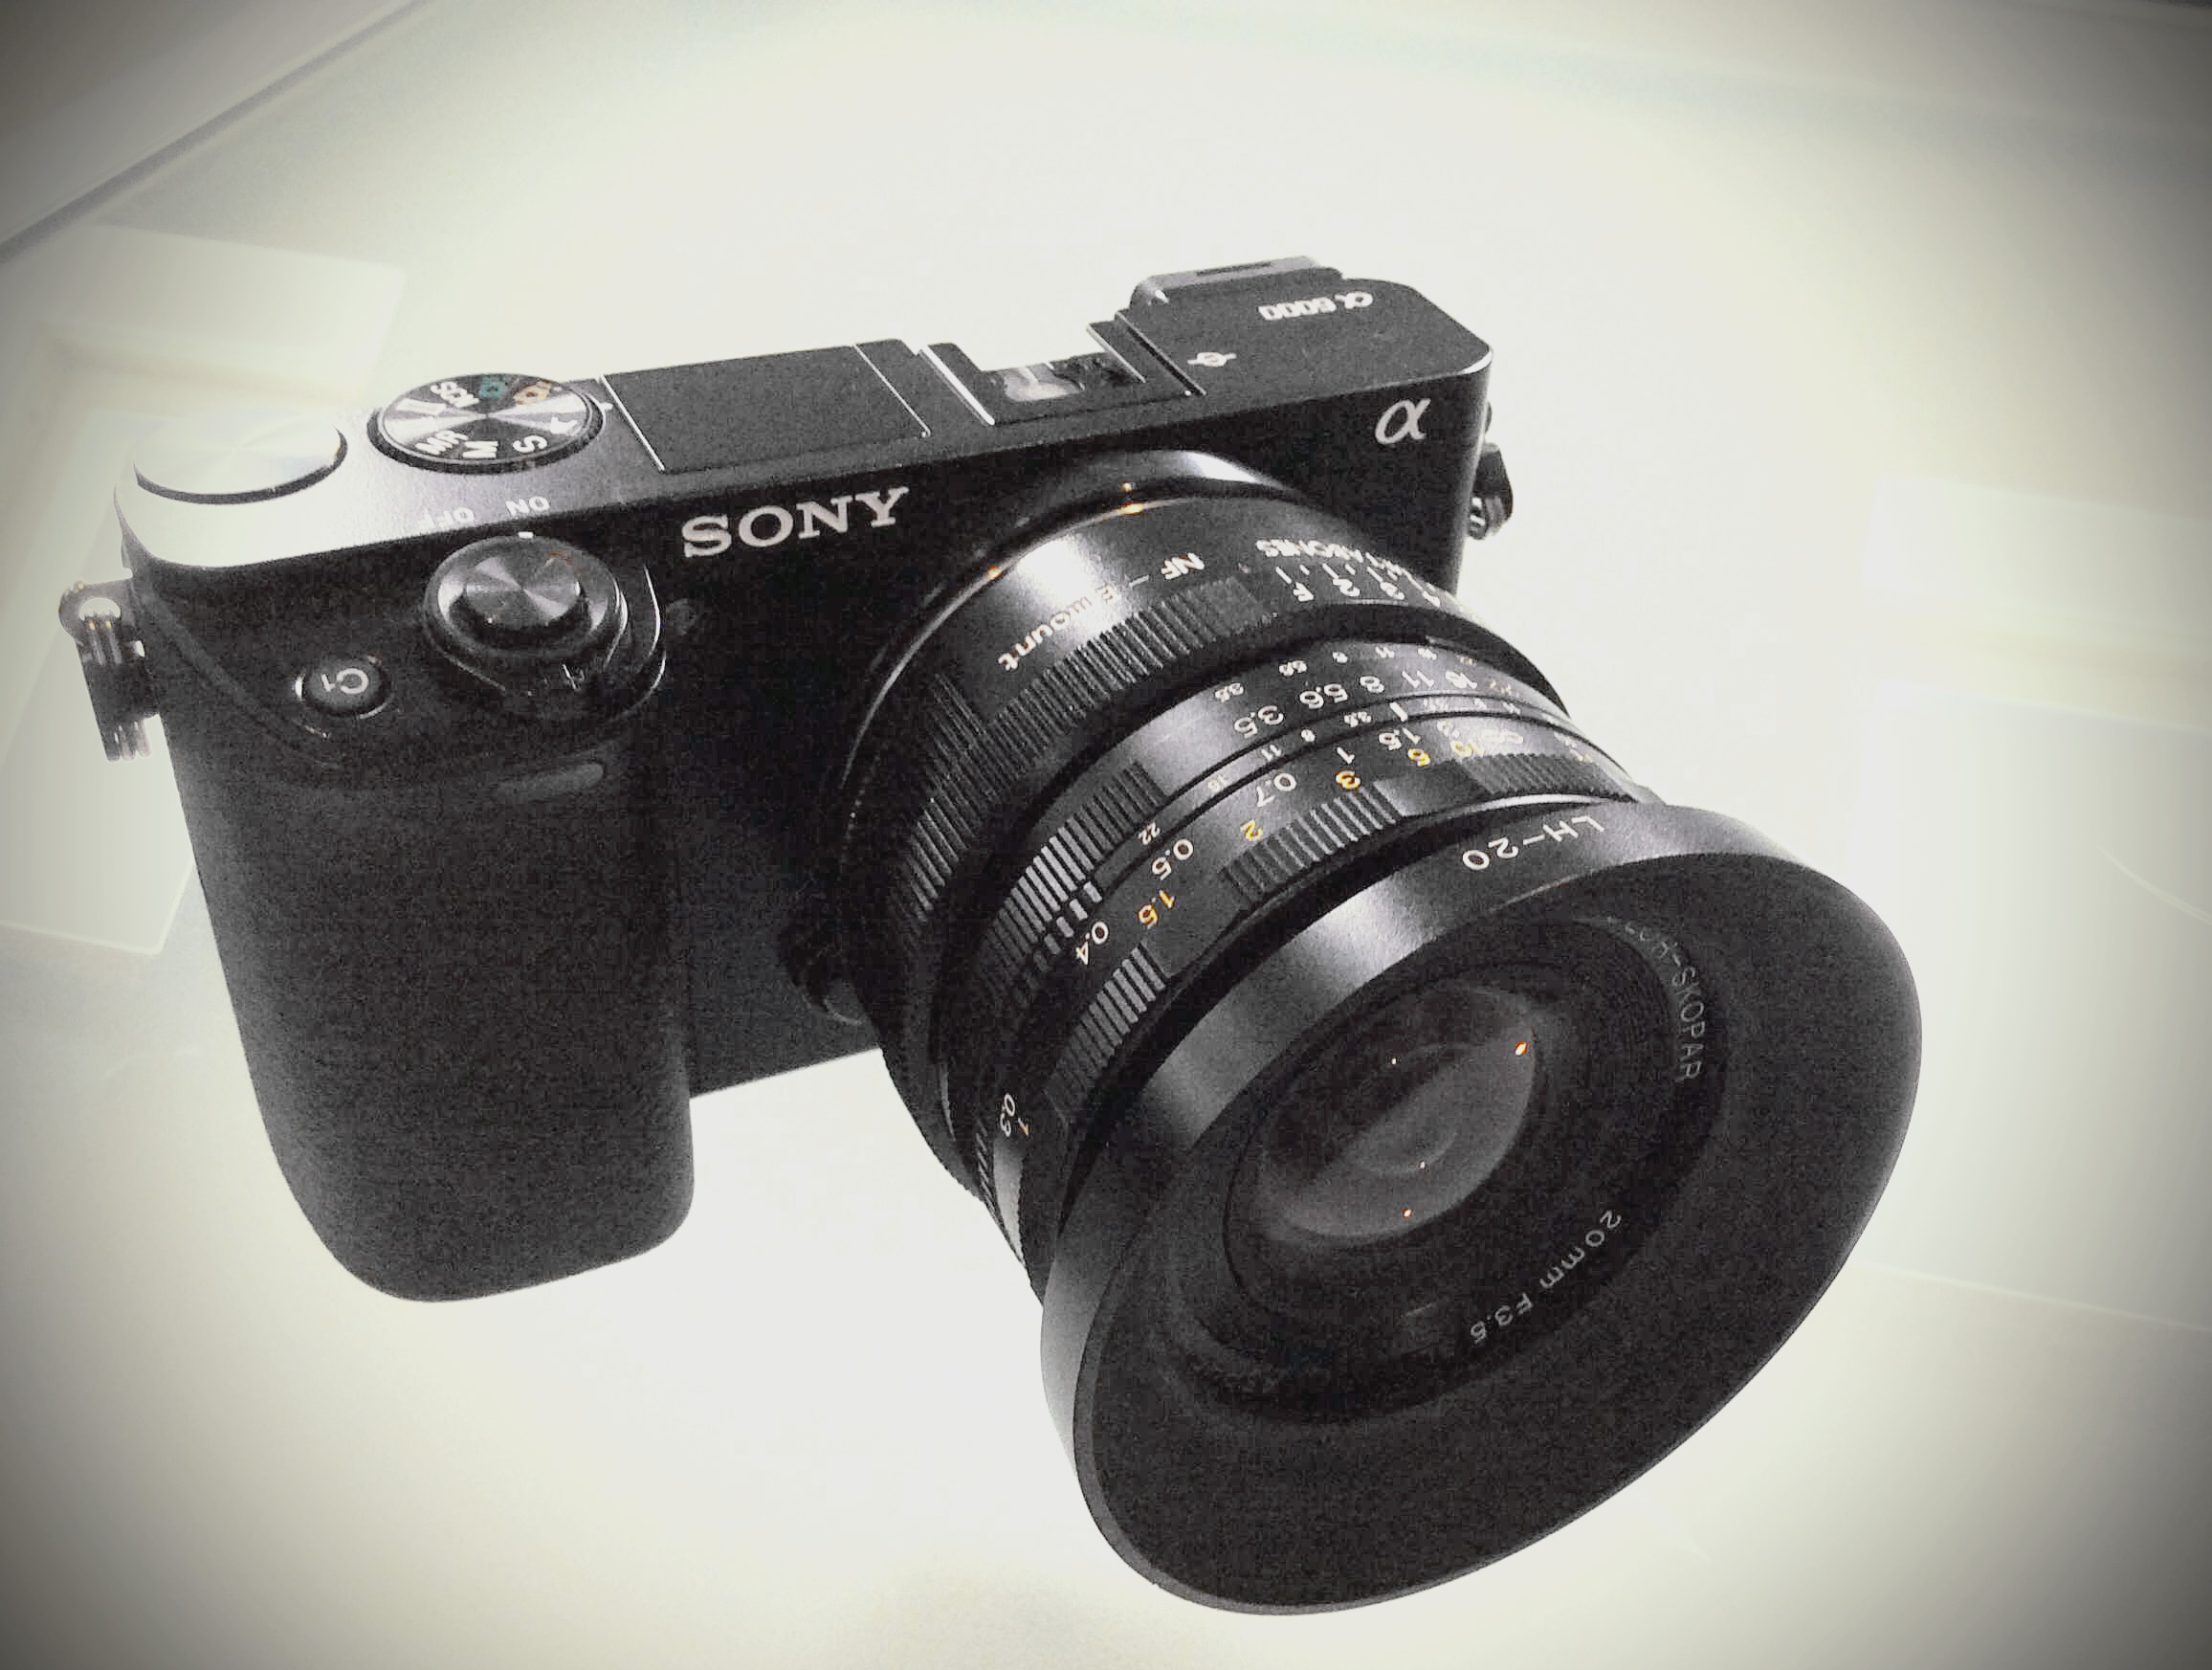 Sony a6000, Voigtländer 20mm f/3.5SL-II AsphericalAI-P (Nikon F-Mount), Kipon Nikon F > e-mount adapter